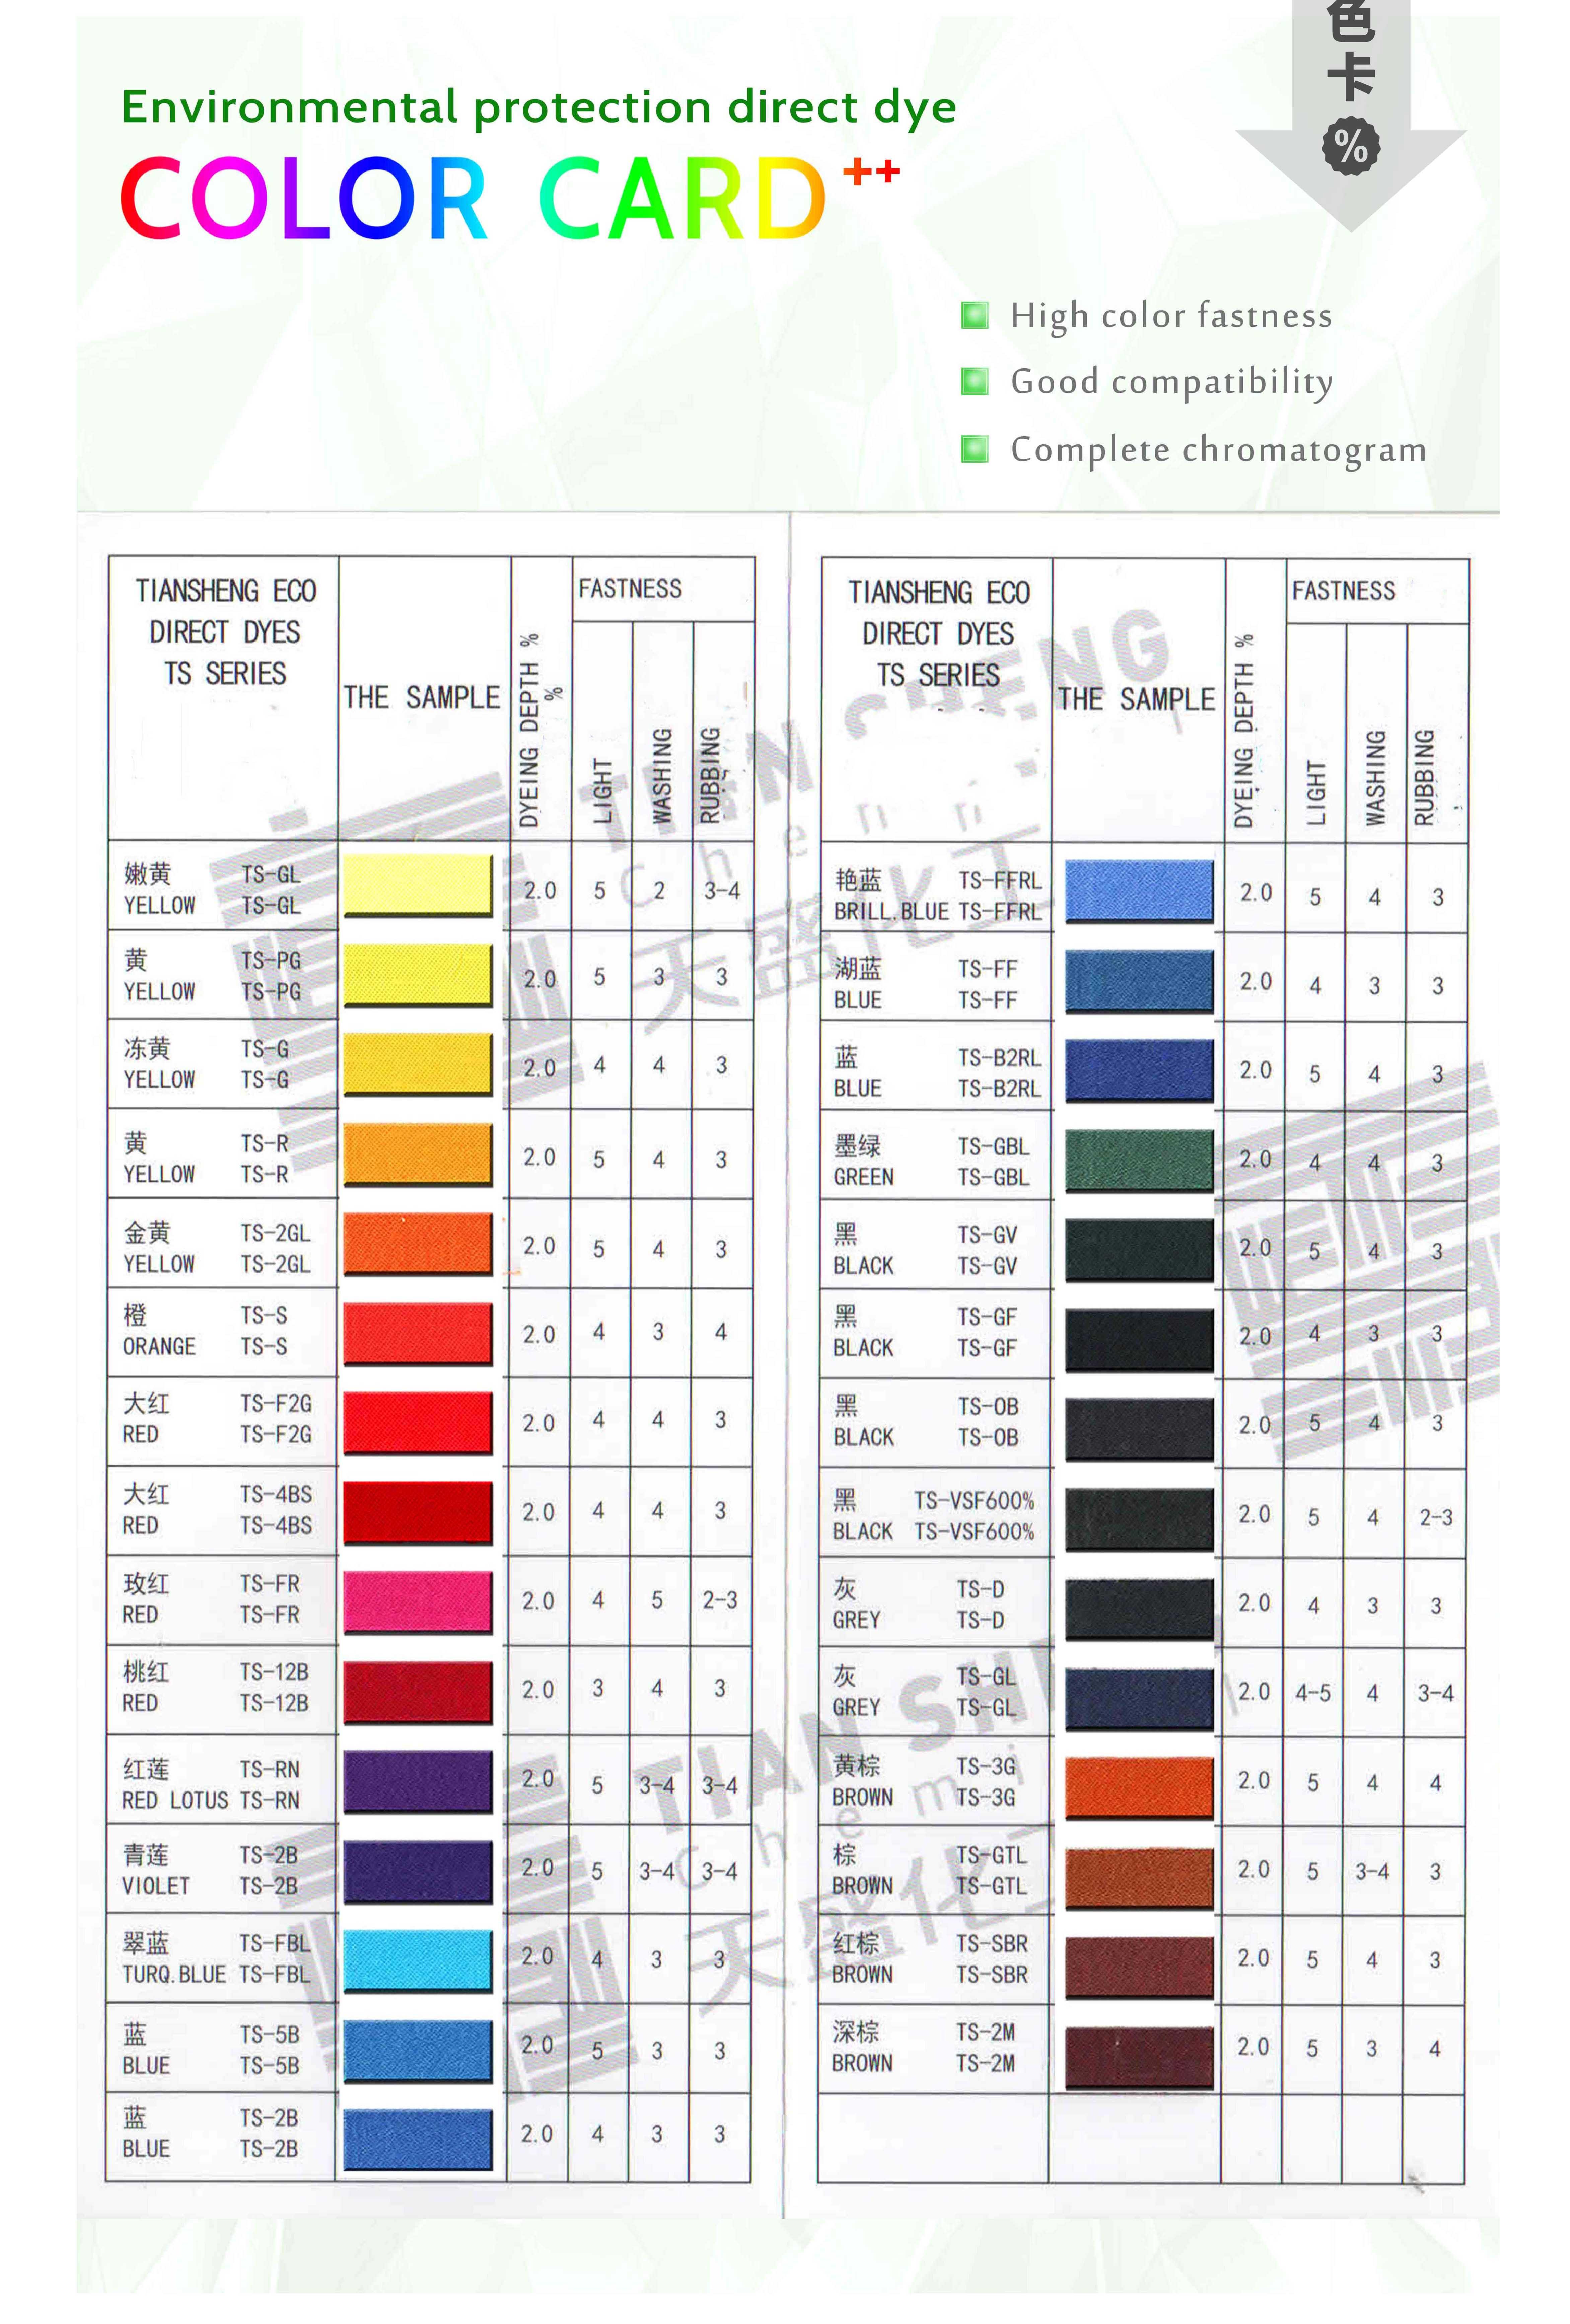 Environmental Direct Dyes